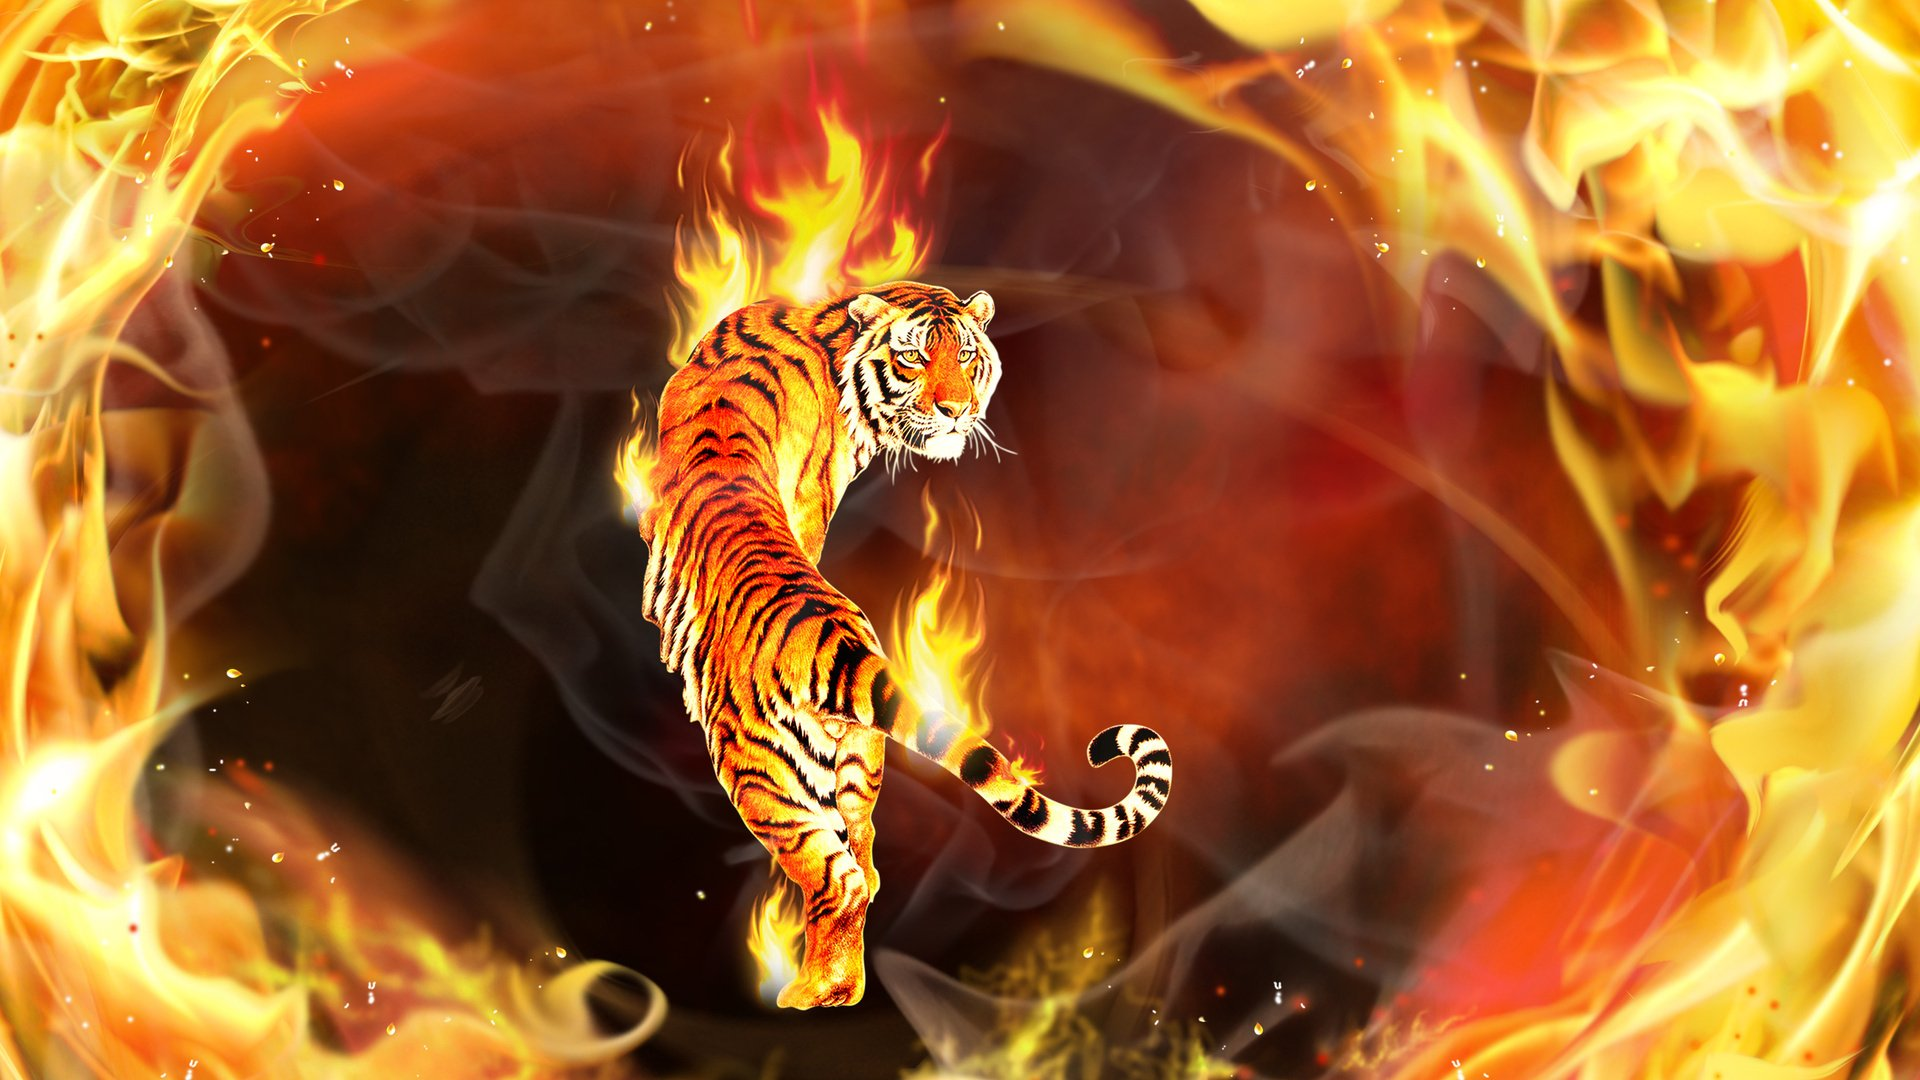 Картинки по запросу тигр огонь